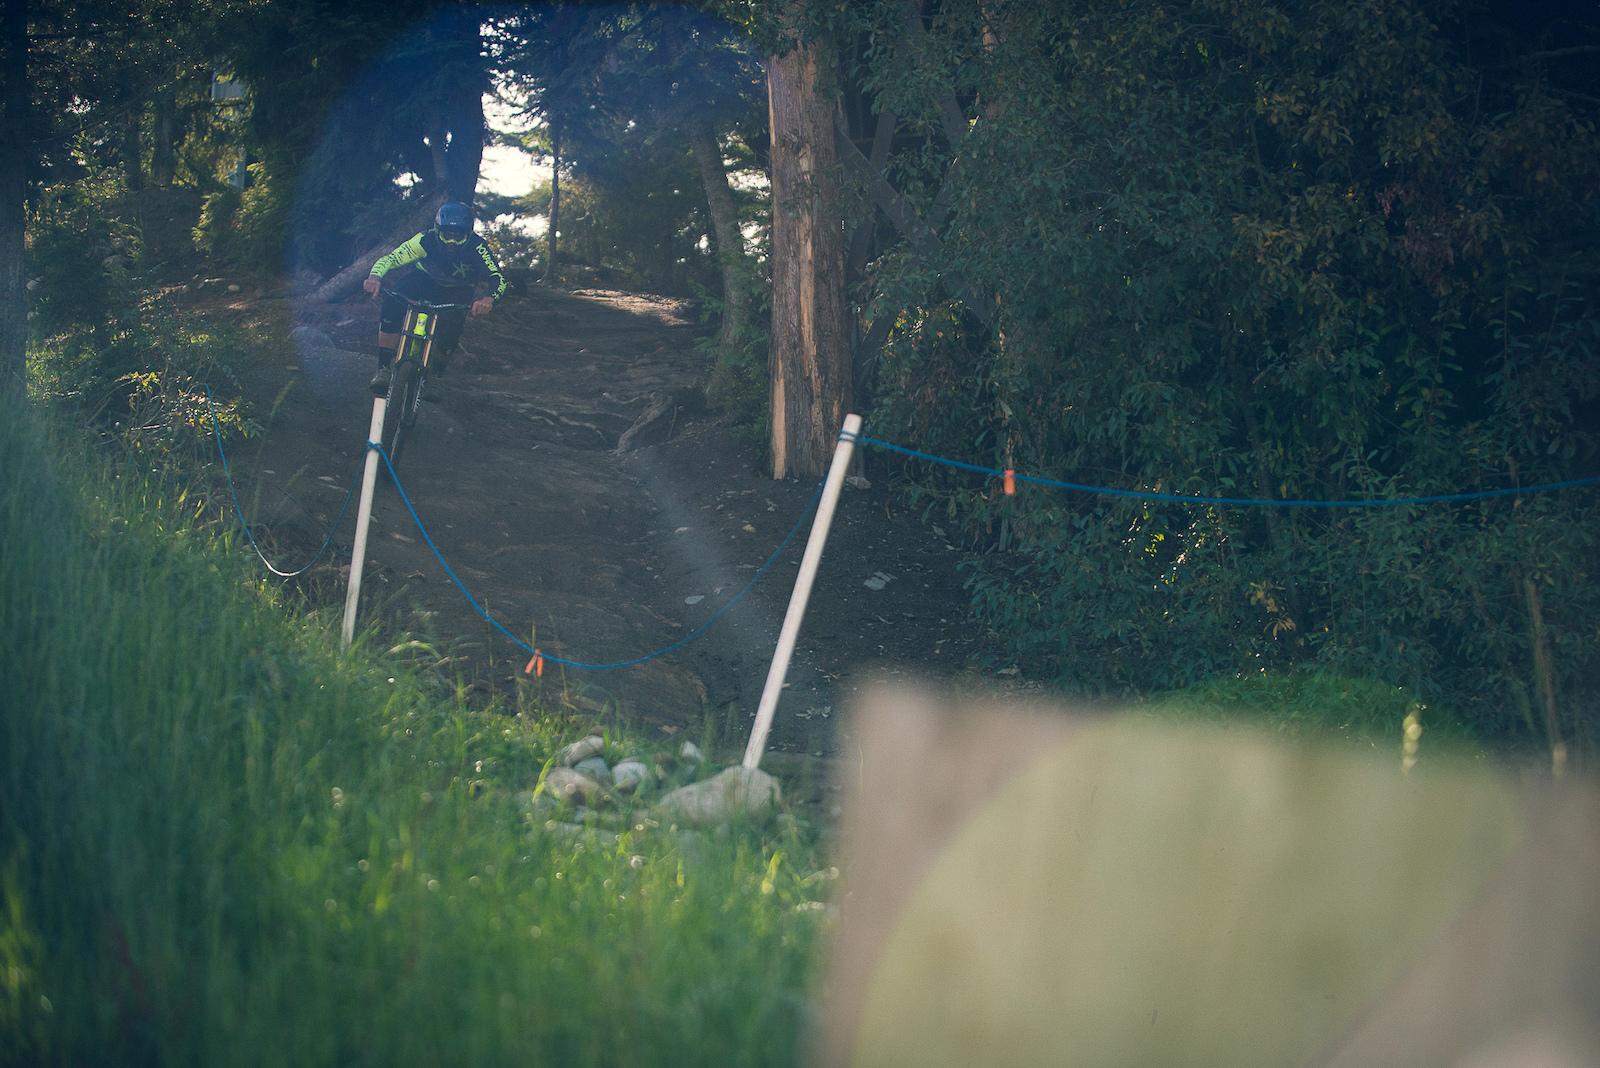 Images from Chris Kovarik s Builder section by Baxter Redfern